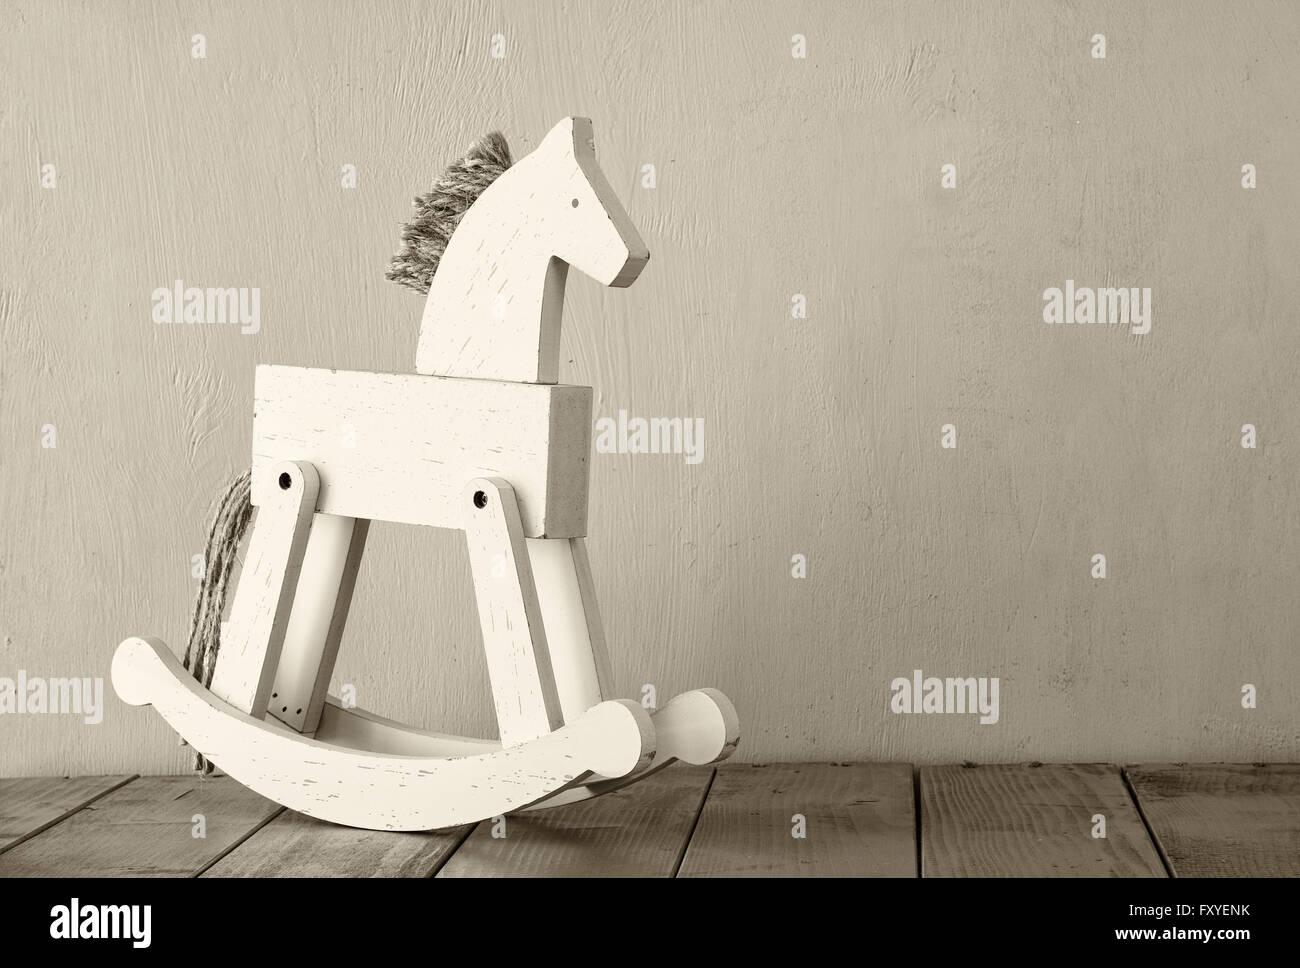 vintage rocking horse on wooden floor. retro filtered image - Stock Image